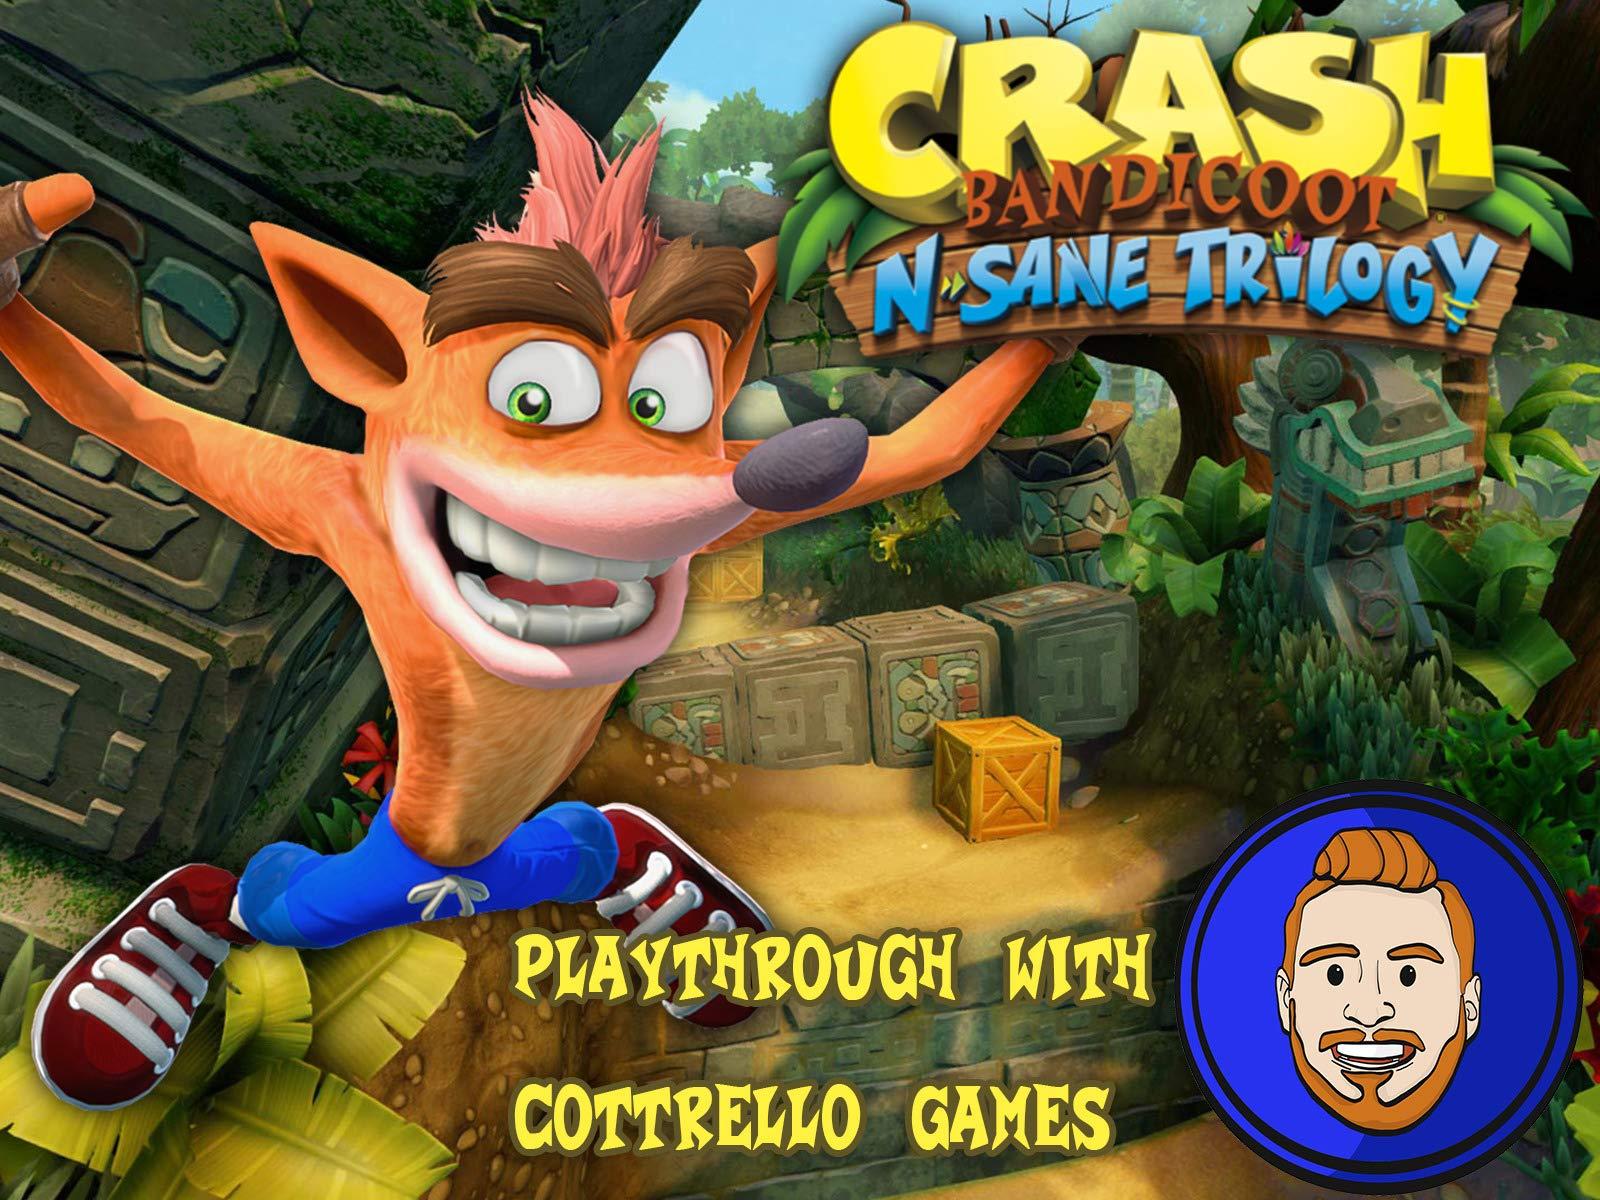 Watch Crash Bandicoot N Sane Trilogy Playthrough With Cottrello